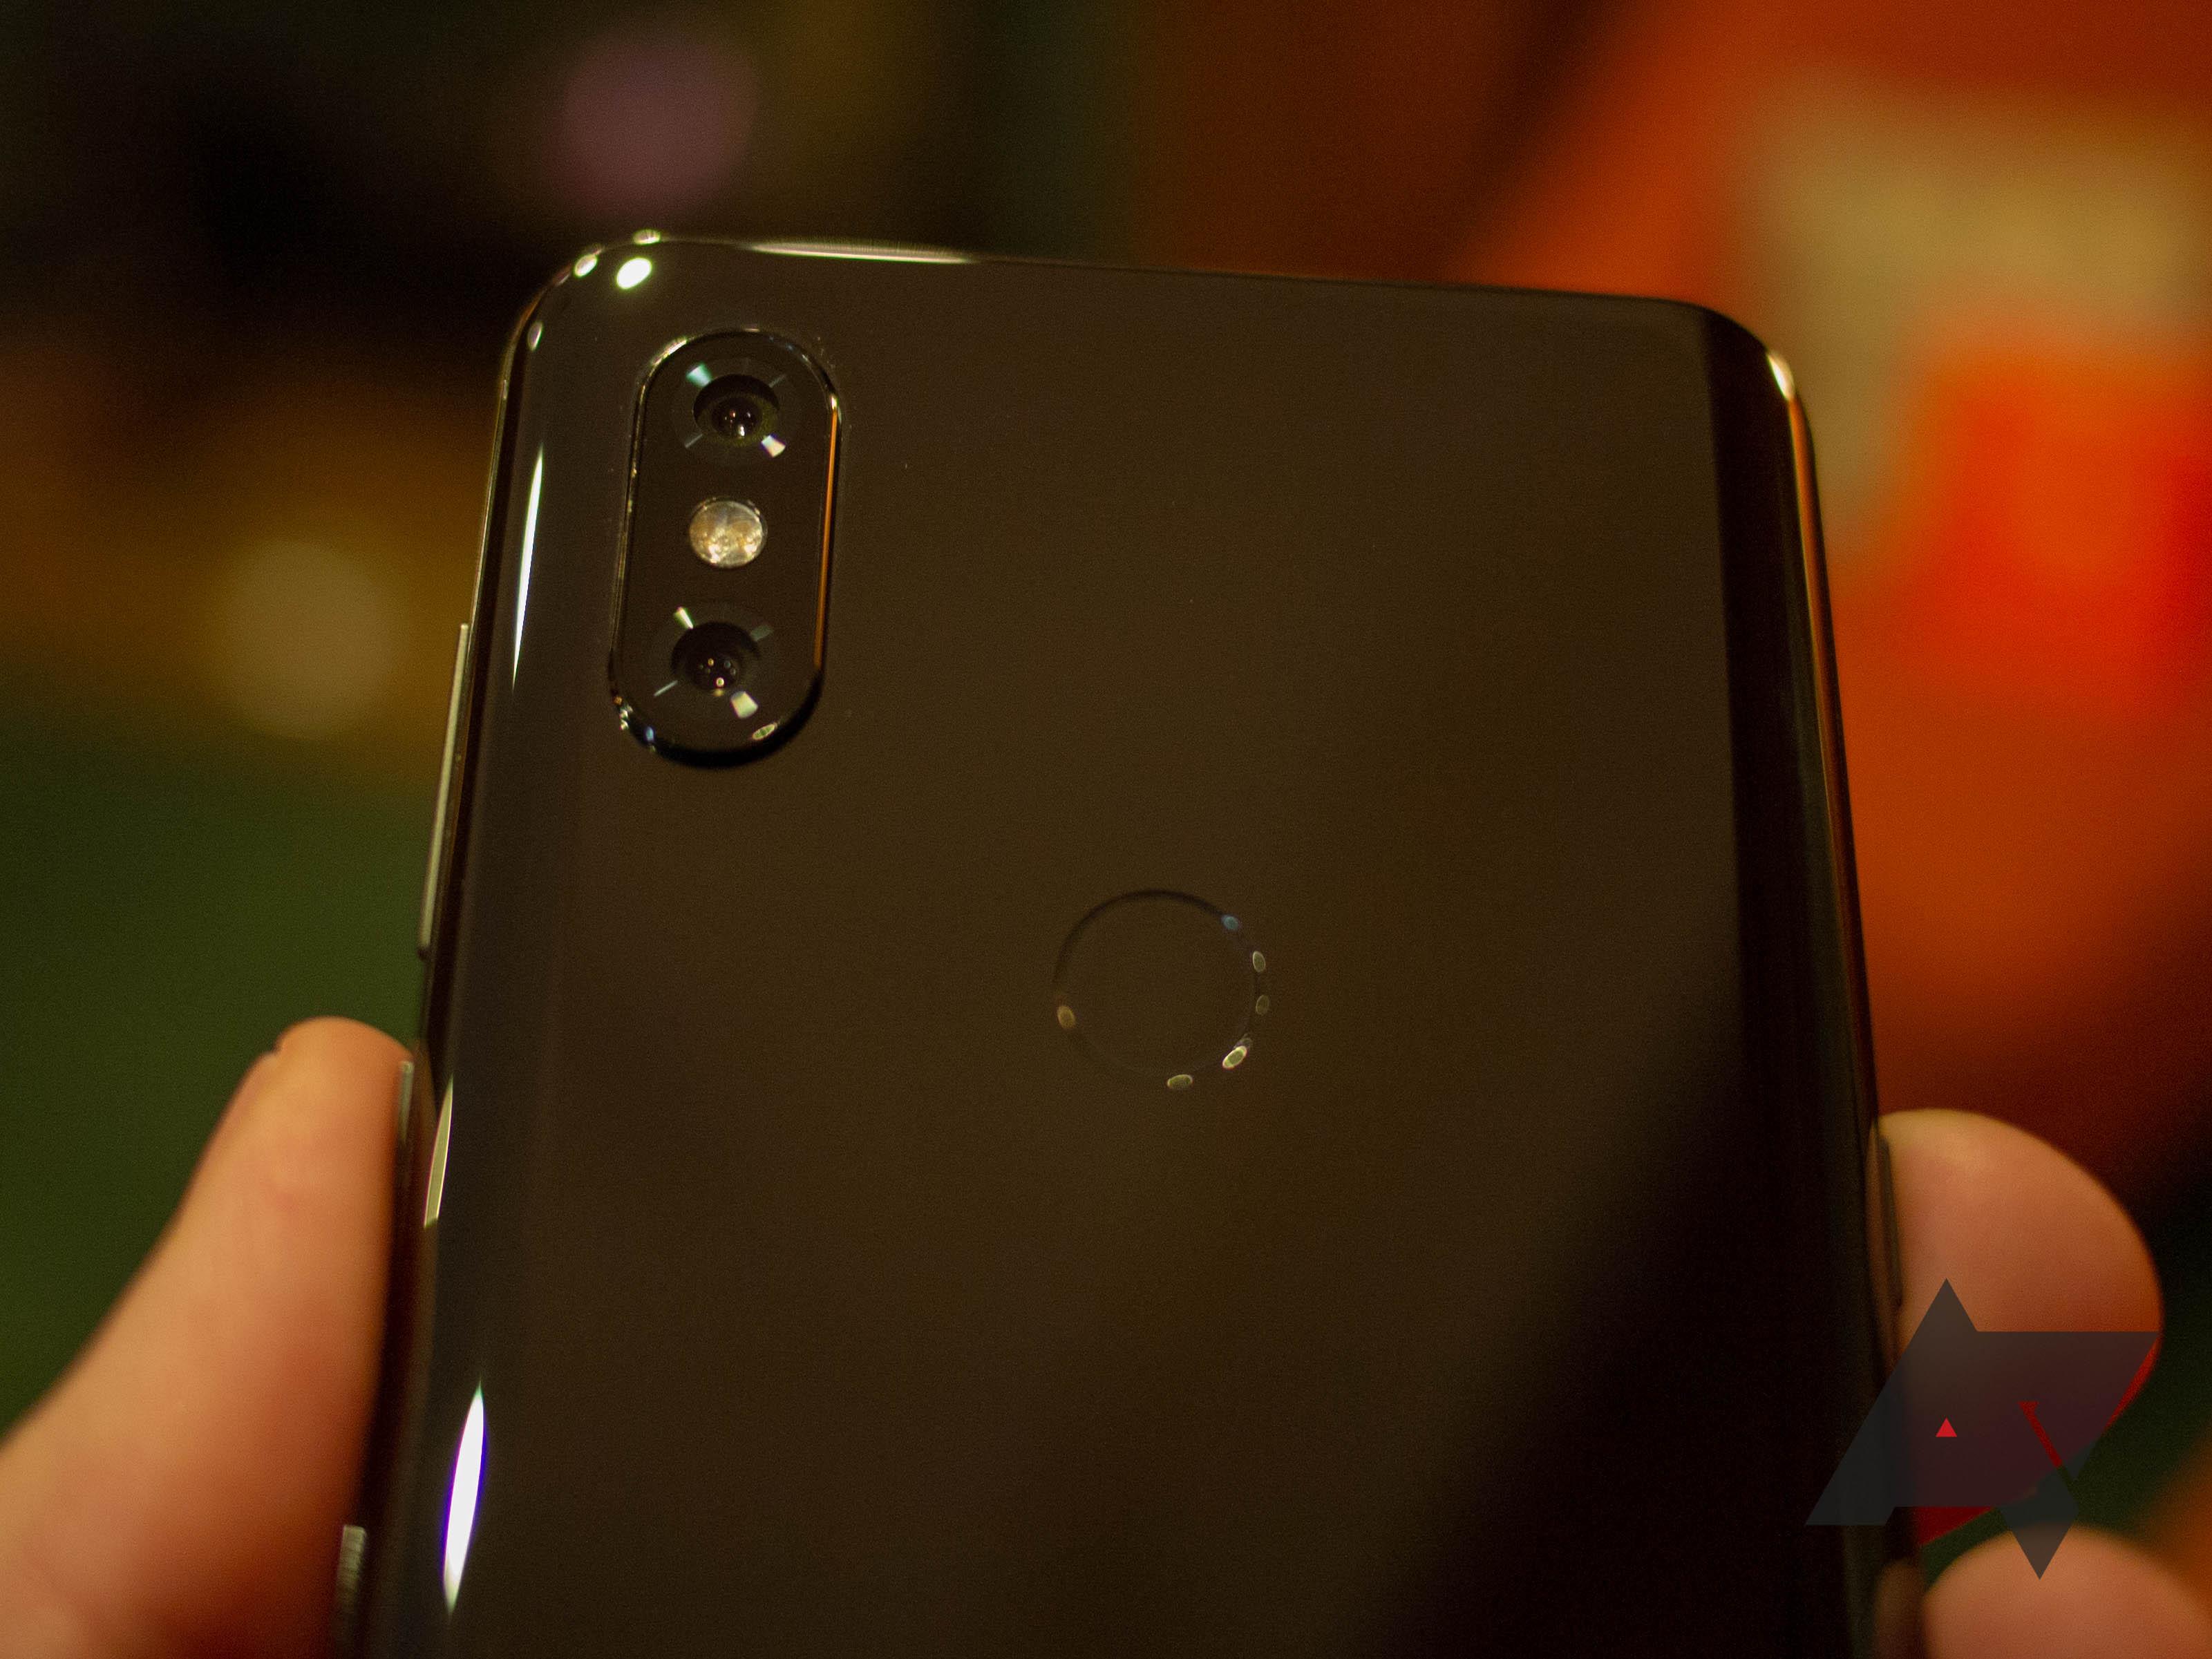 Xiaomi Mi Mix 3 hands-on: A notch-hater's dream